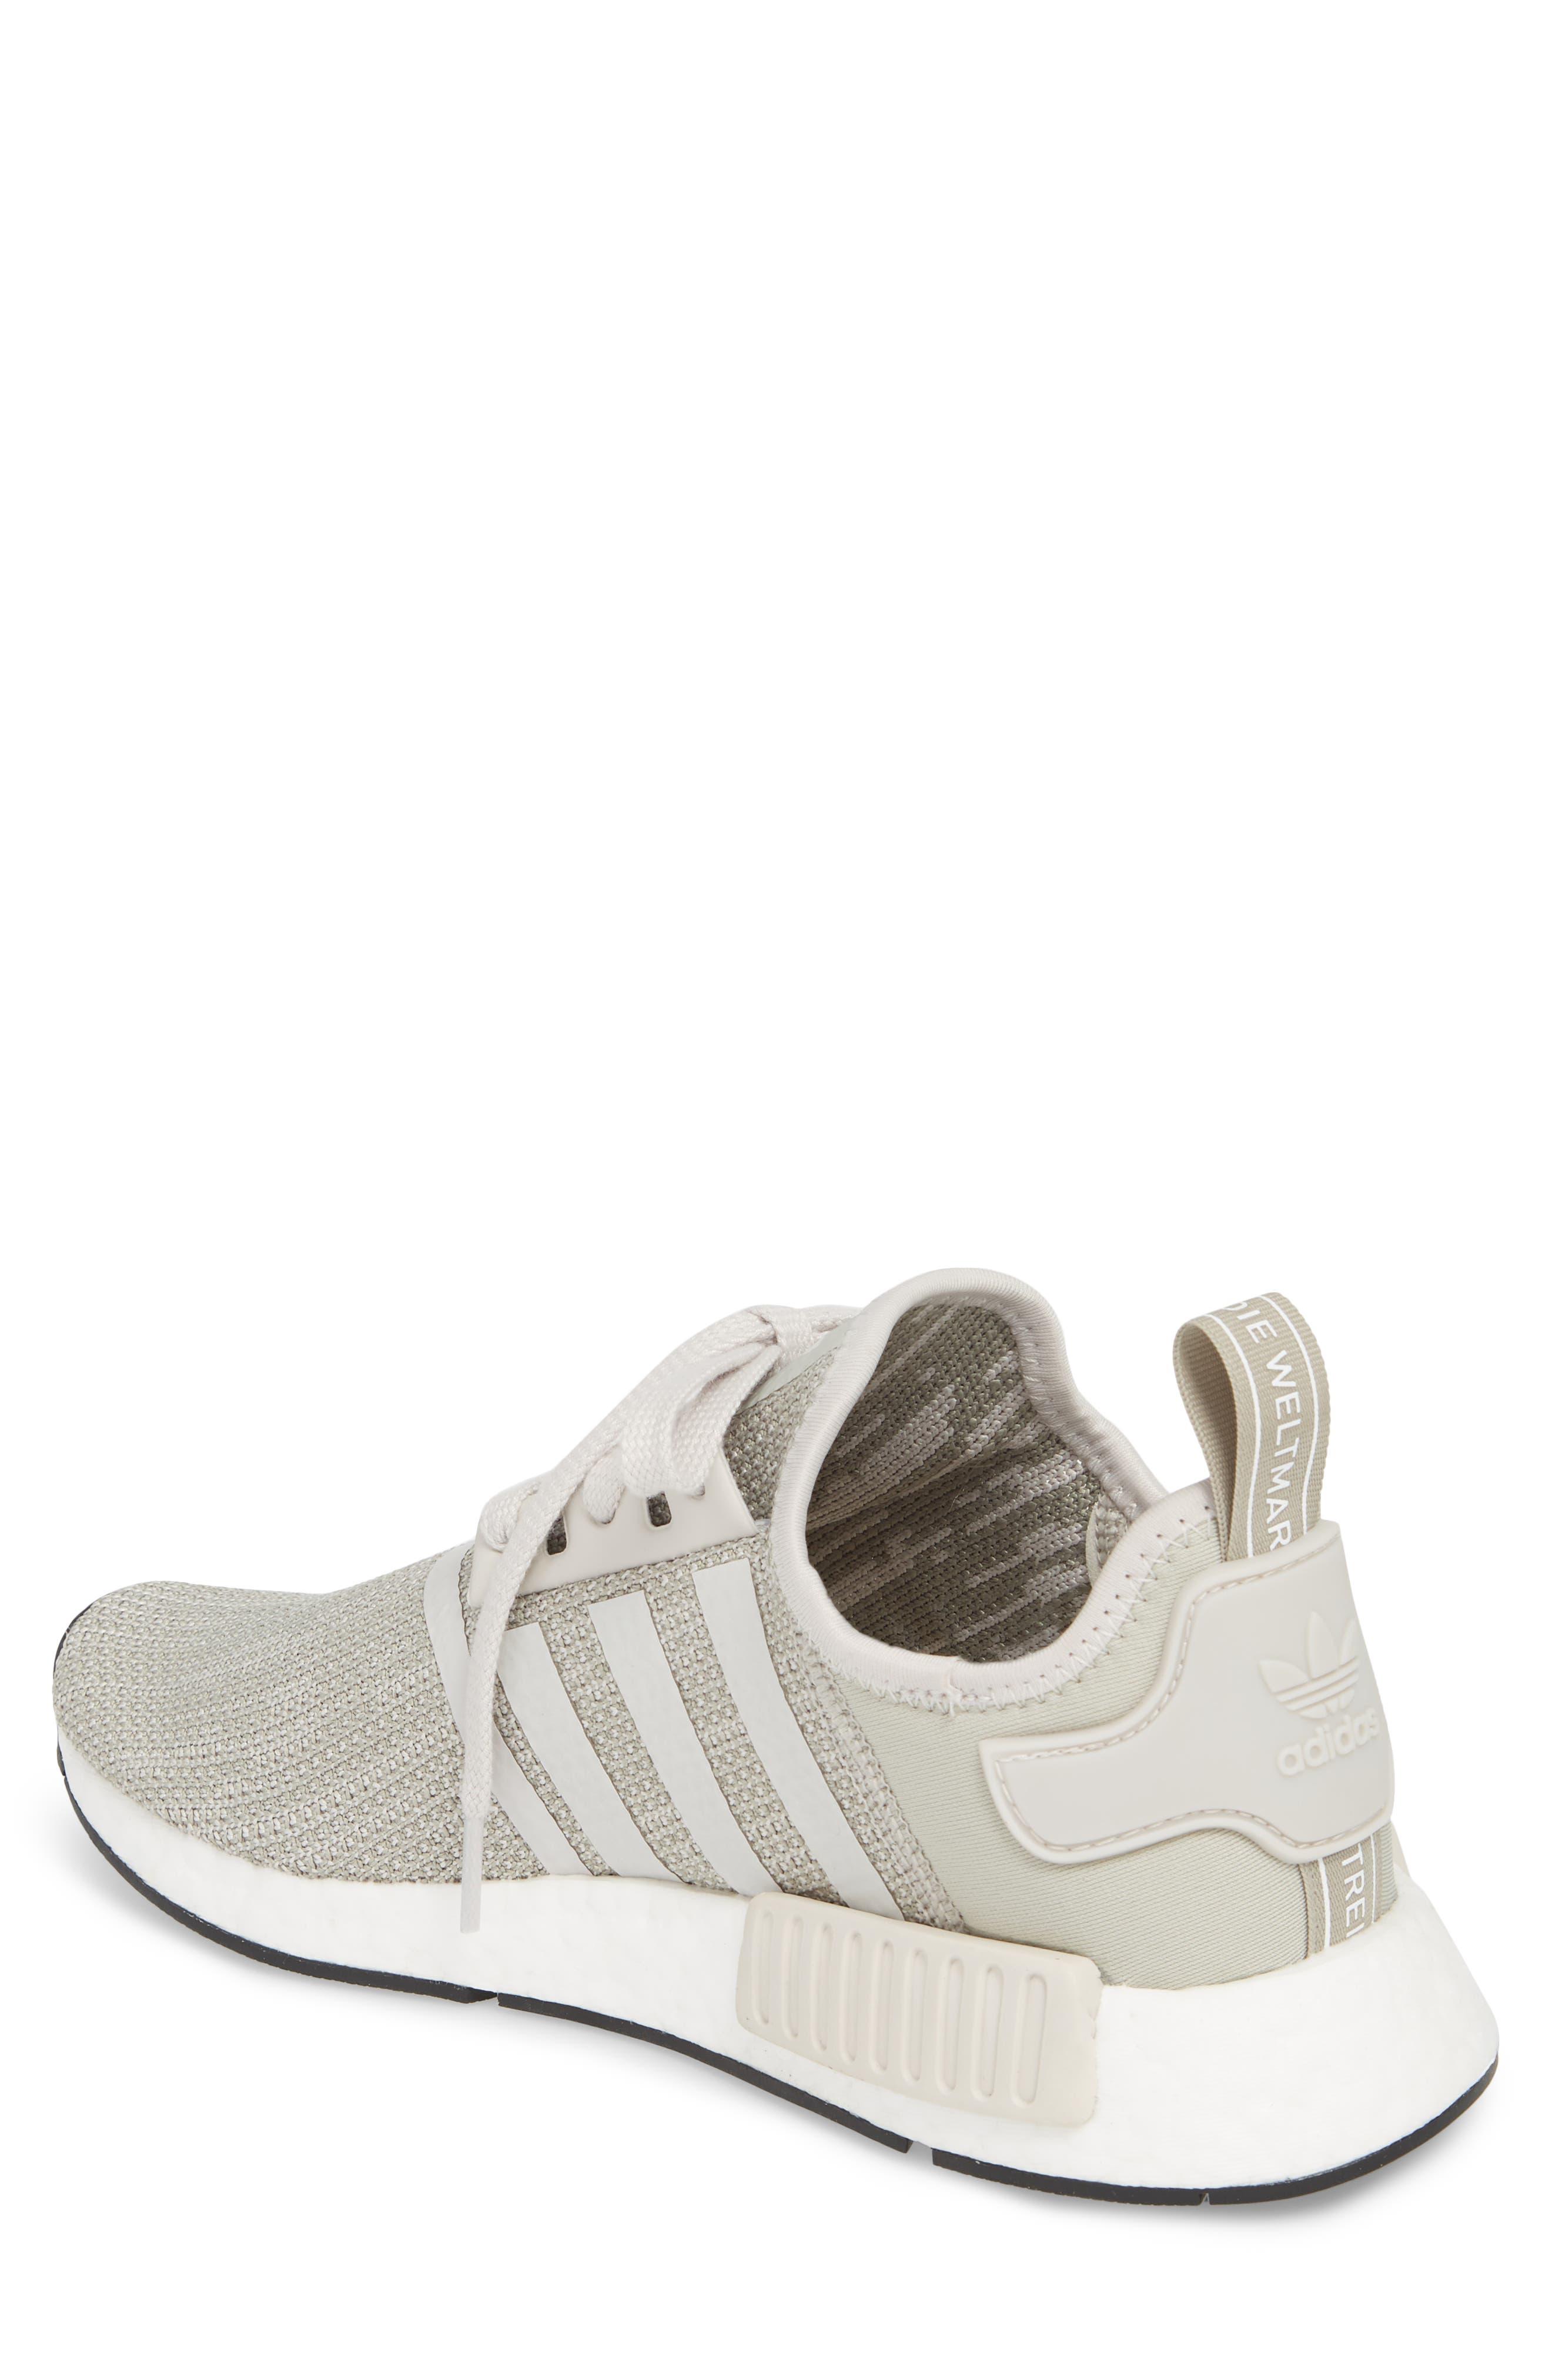 NMD_R1 Sneaker,                             Alternate thumbnail 2, color,                             Raw Gold/ Tech Beige/ Black